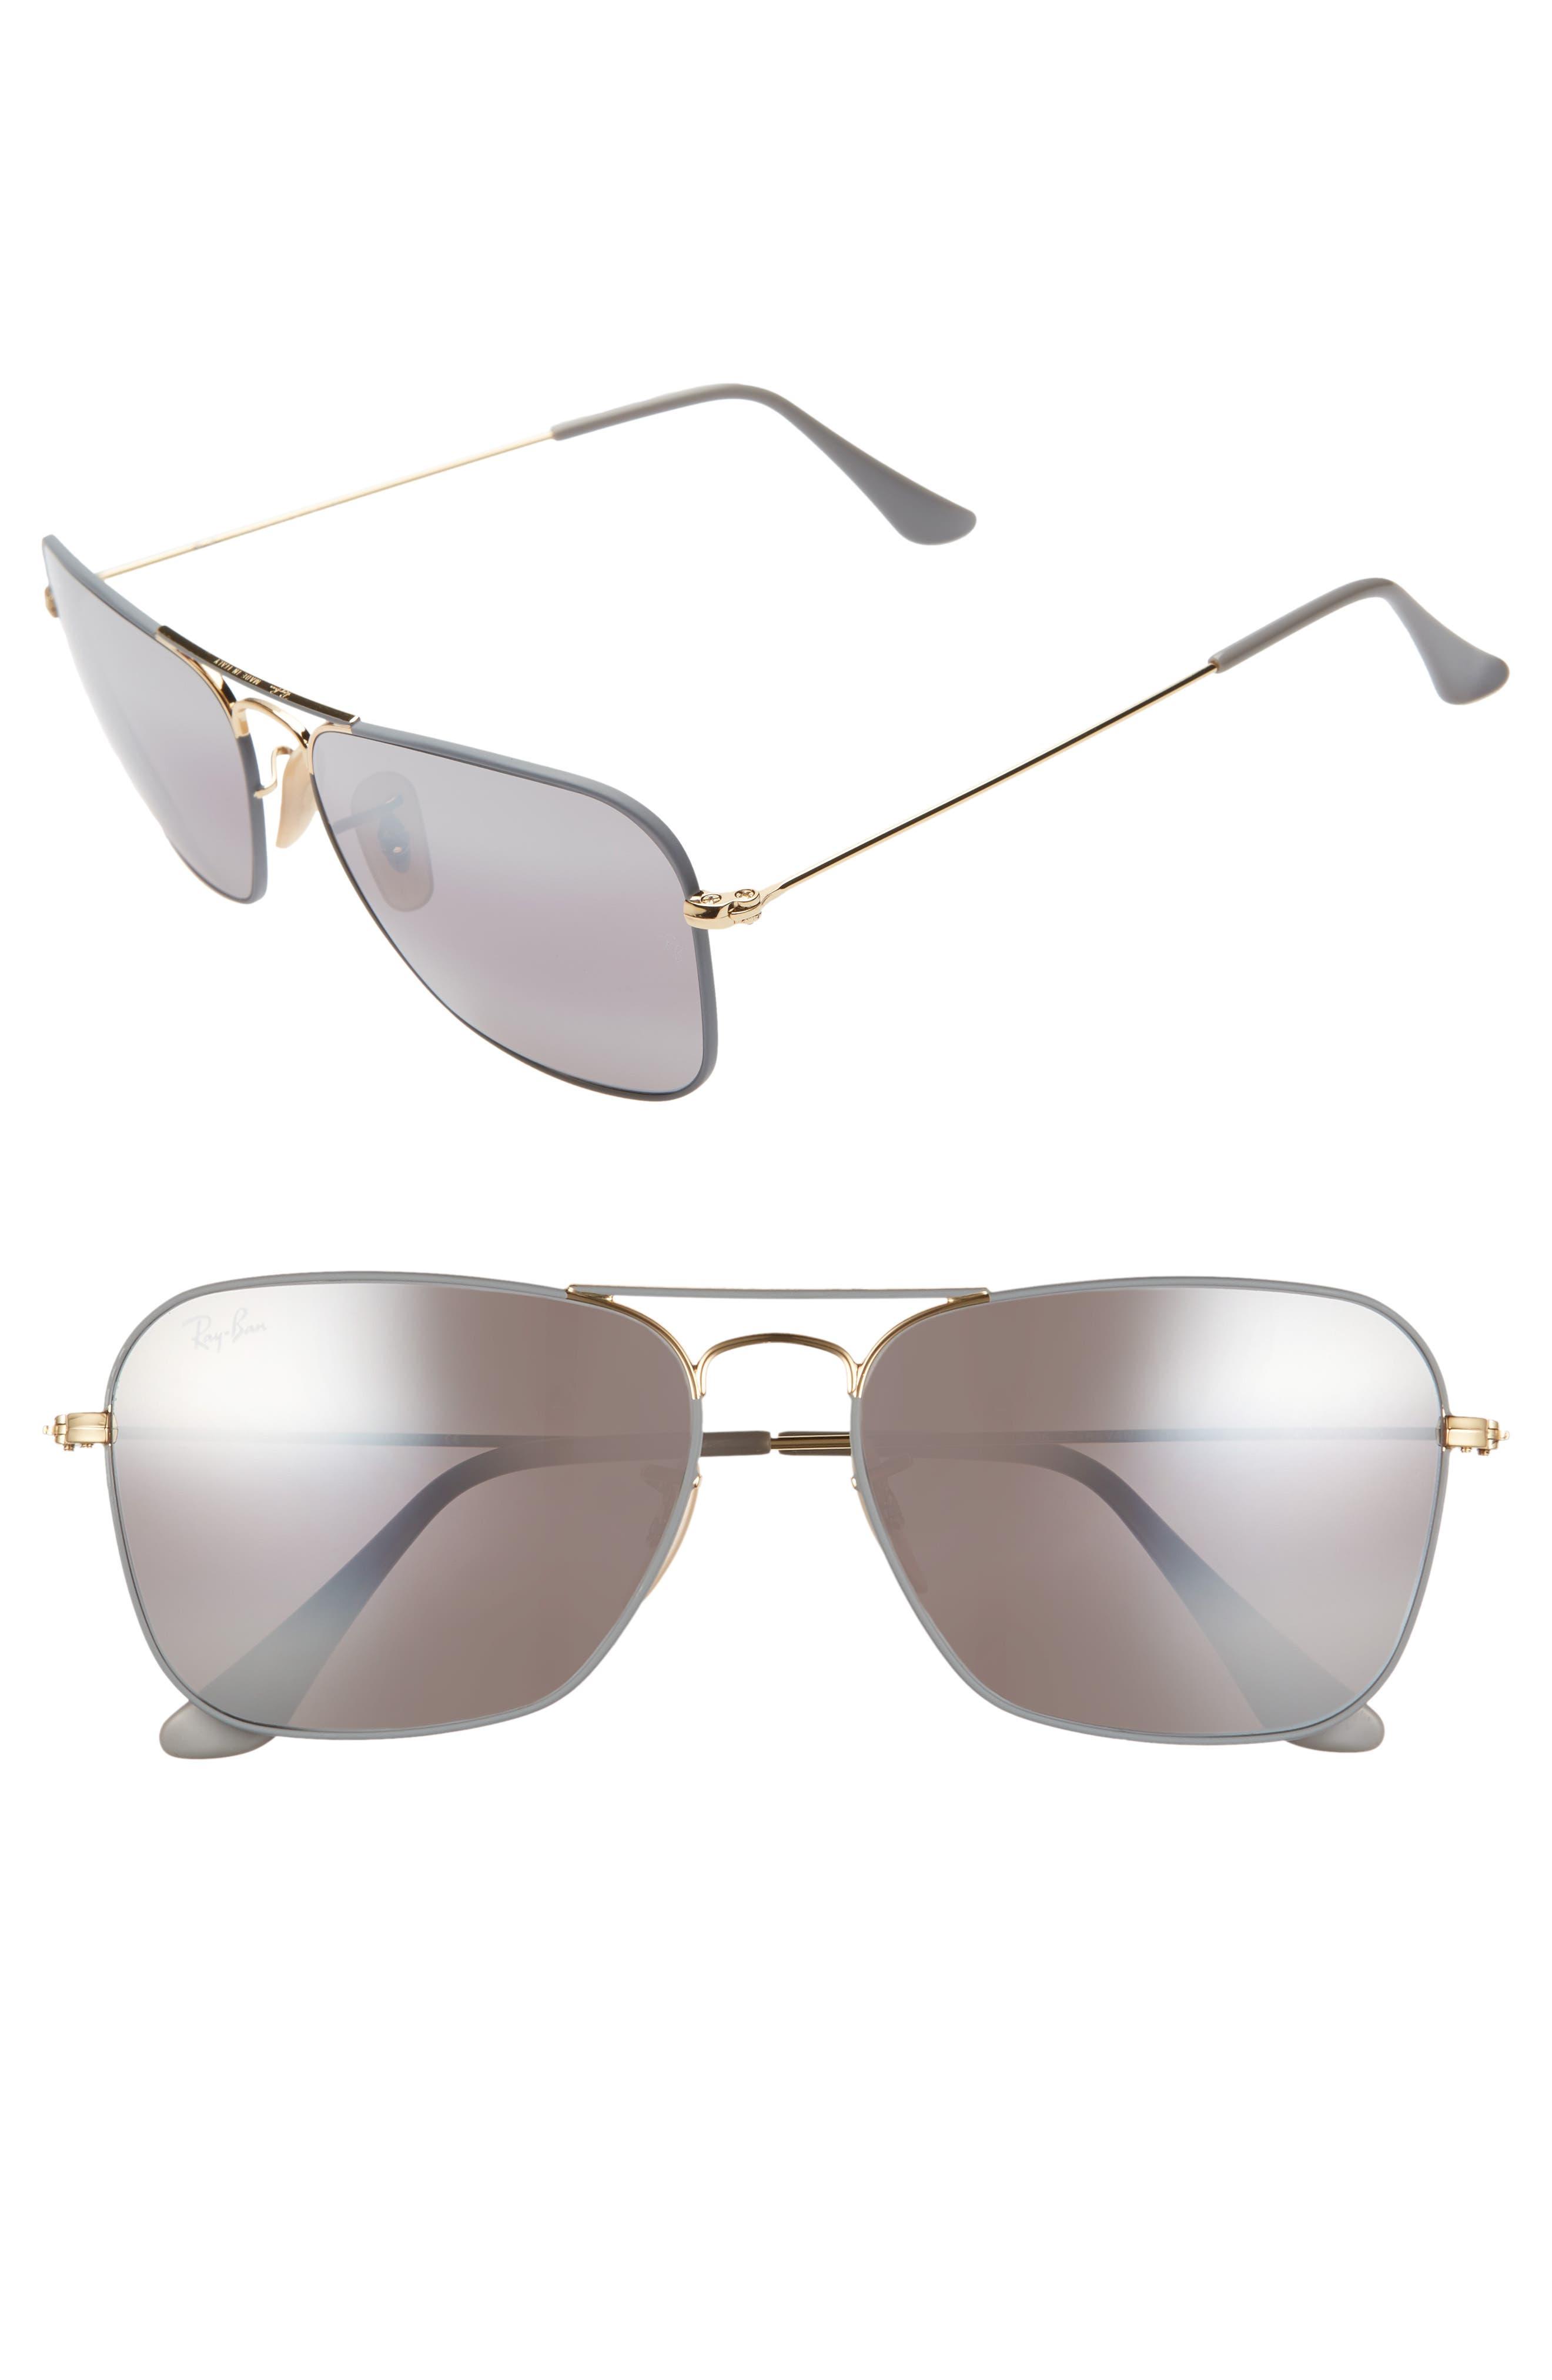 Ray-Ban 5m Aviator Sunglasses - Gold/ Grey Mirror